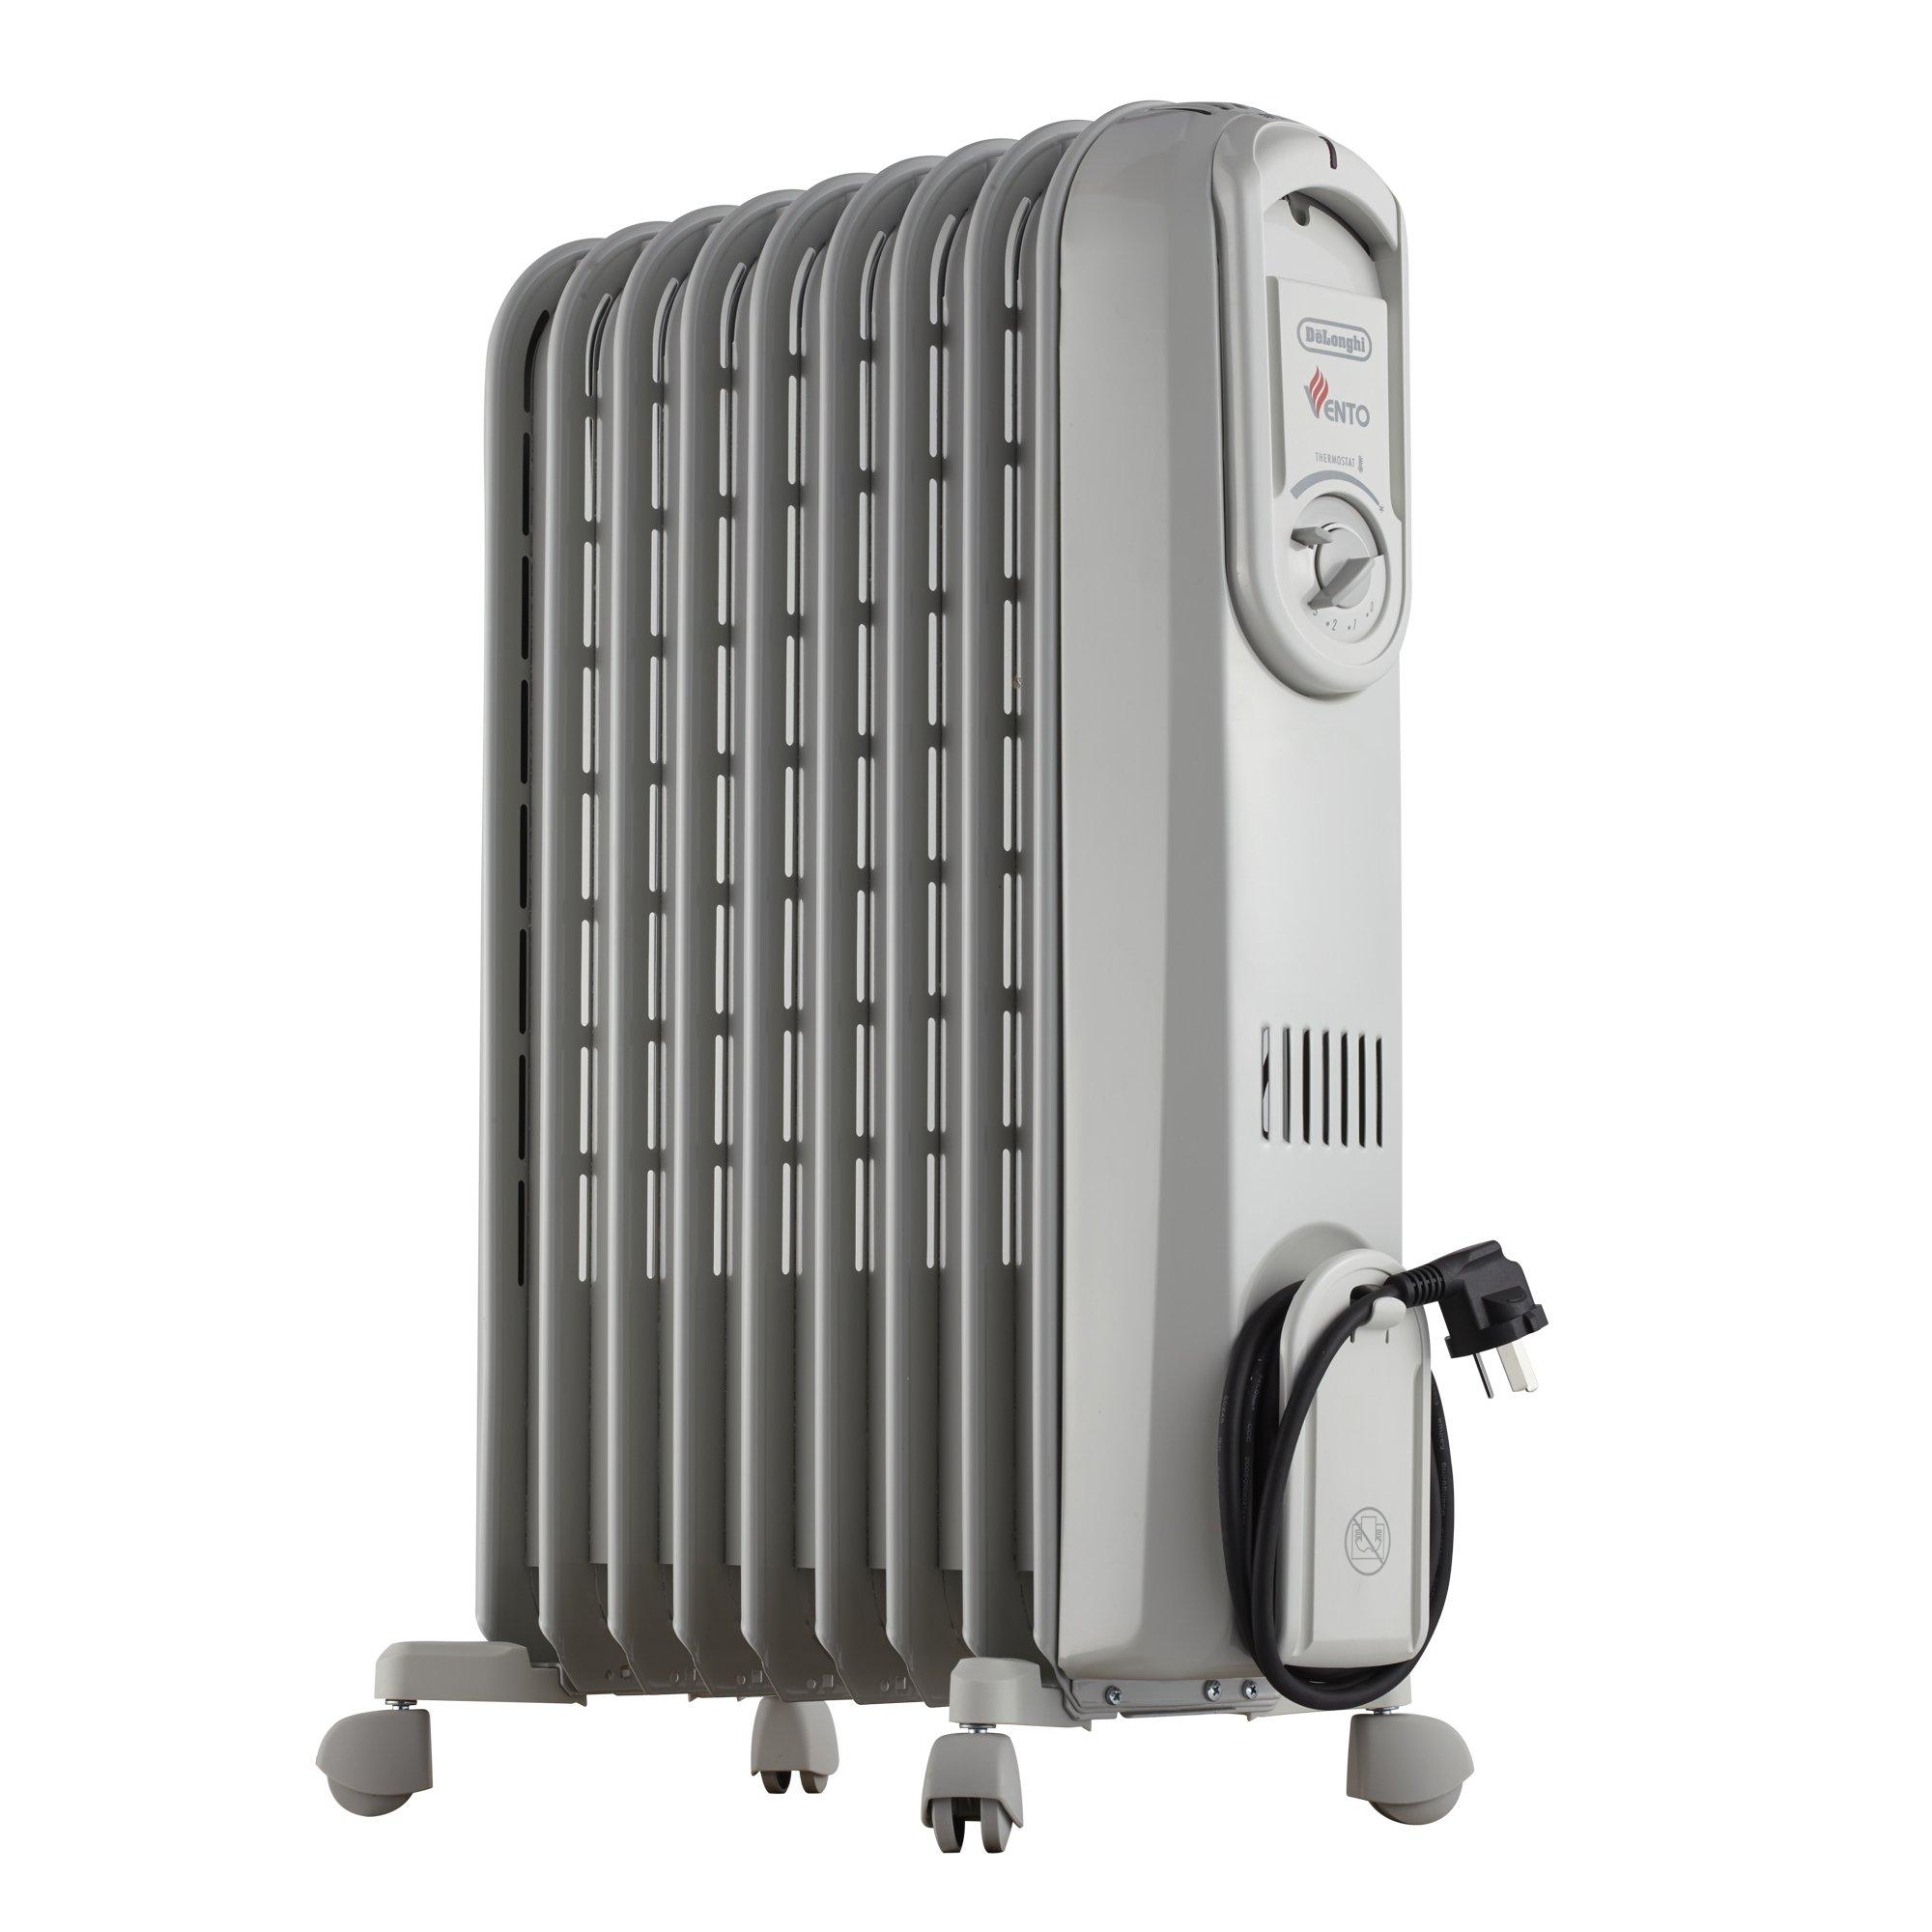 DeLonghi V550920 - Radiador de aceite, 2000 W, color gris product image